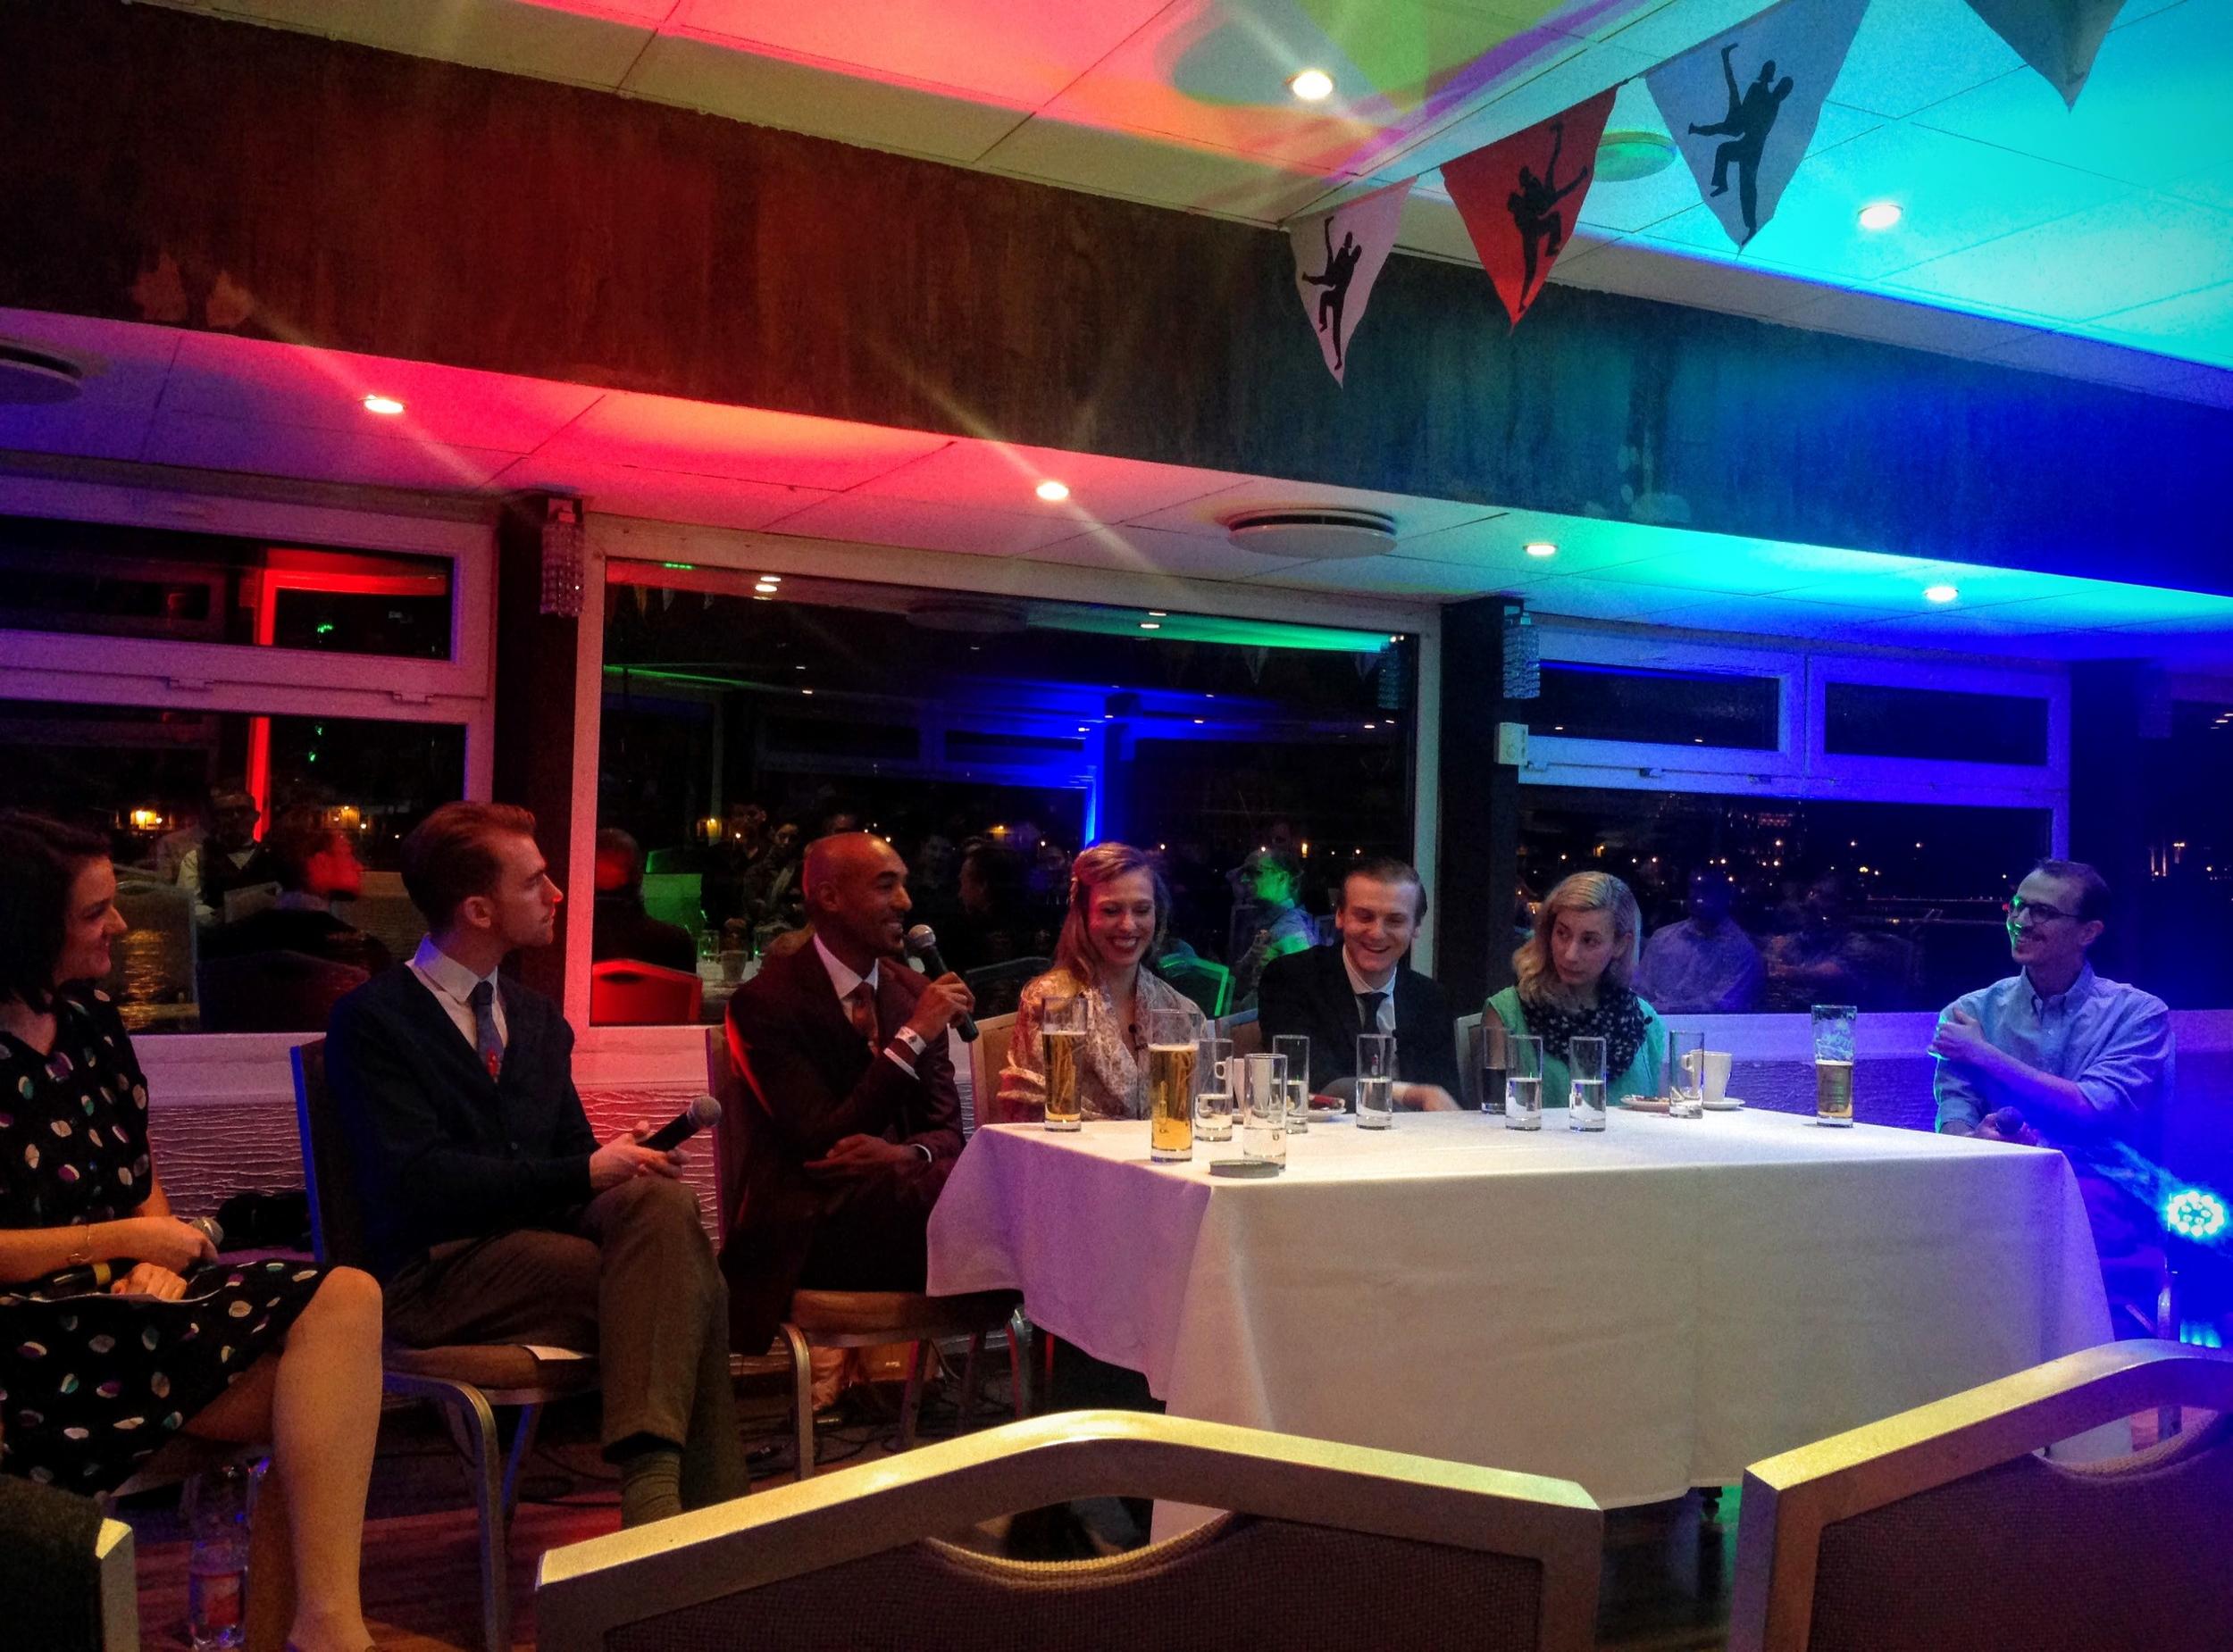 SECOND NIGHT, from  L  to  R : Nina Jukic, Marcus Nutzinger,Remy Kouakou Kouame, Laura Keat, Alex Parker, Natalia Eristavi and Alexei Korolyov